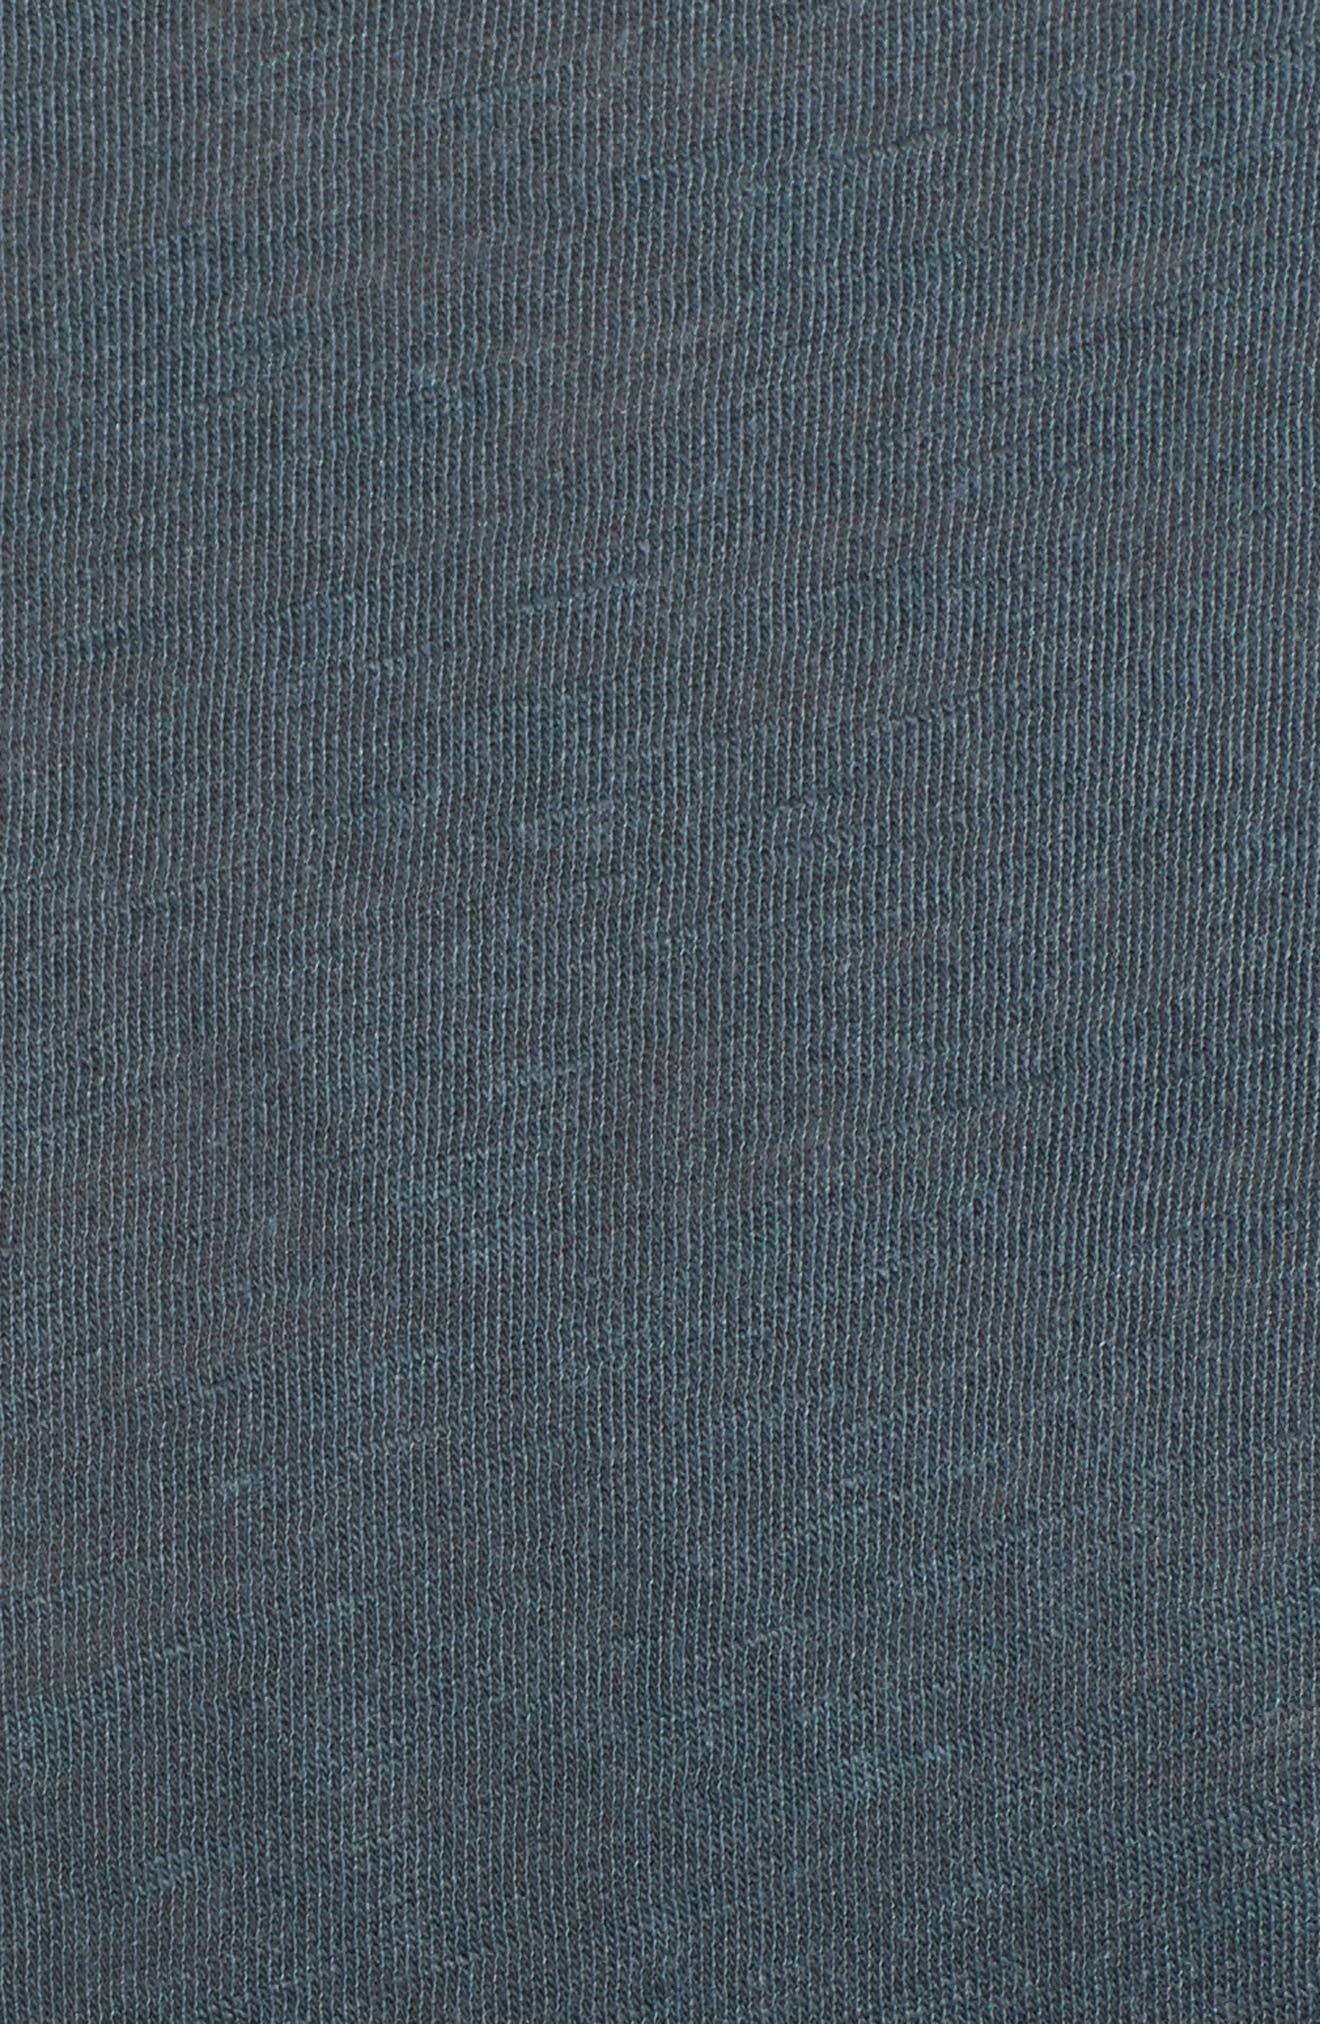 Alternate Image 5  - Stateside Pleat T-Shirt Dress